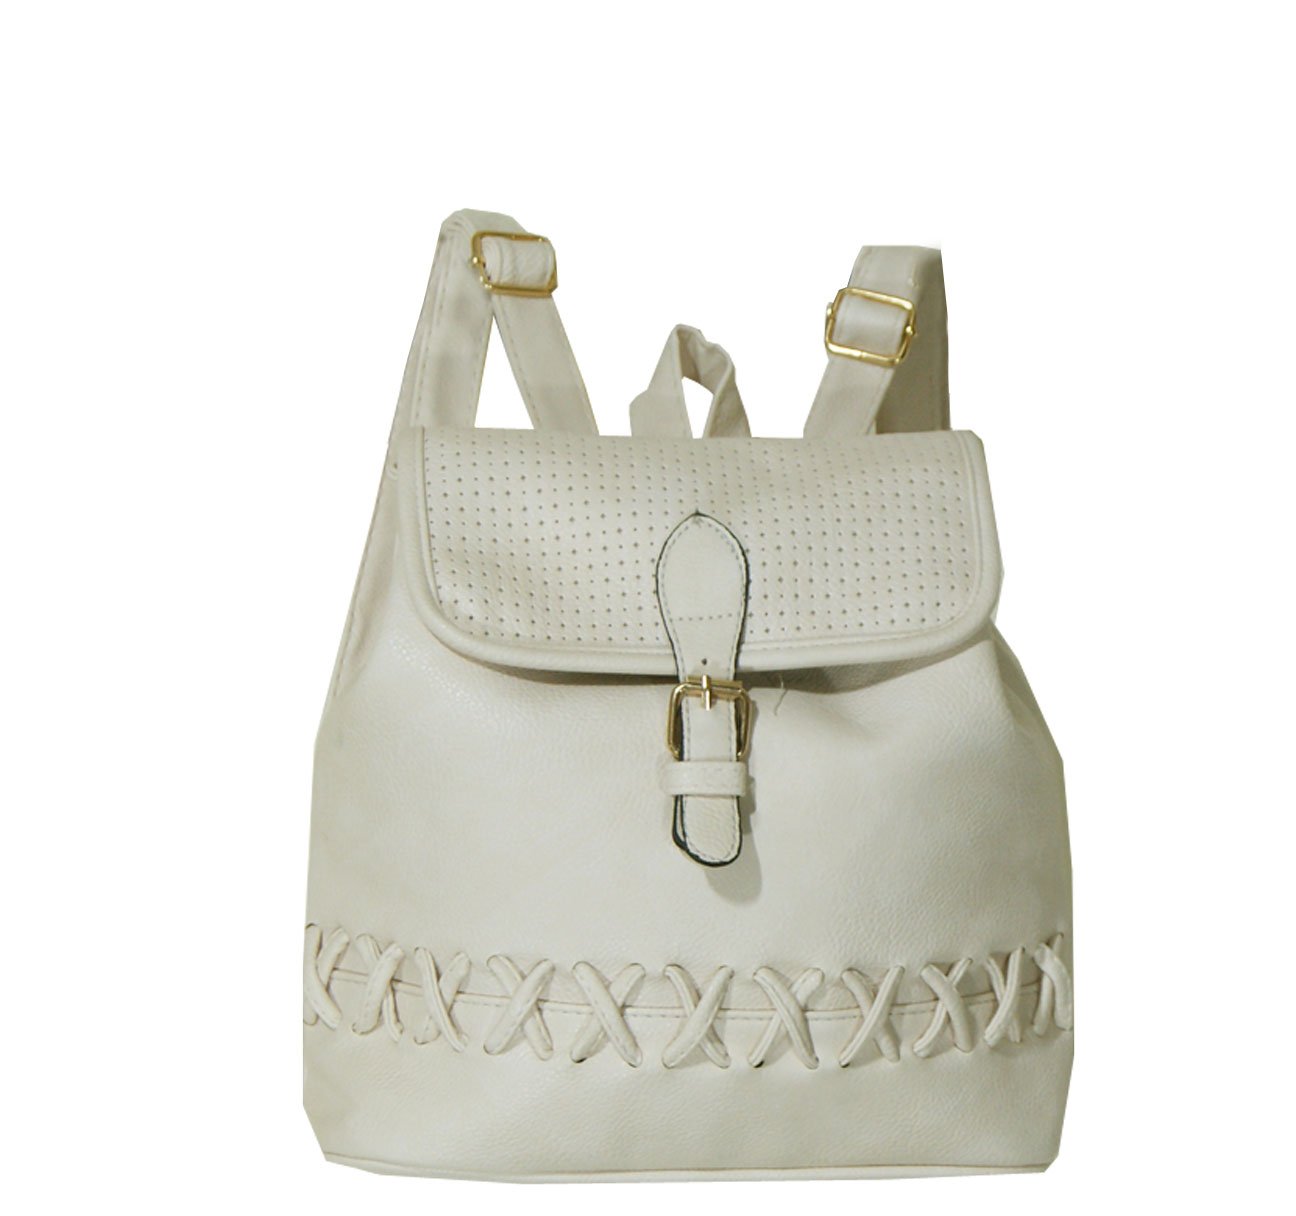 Backpack No 2007 - Ιβουάρ (Borse Antonio 2007)